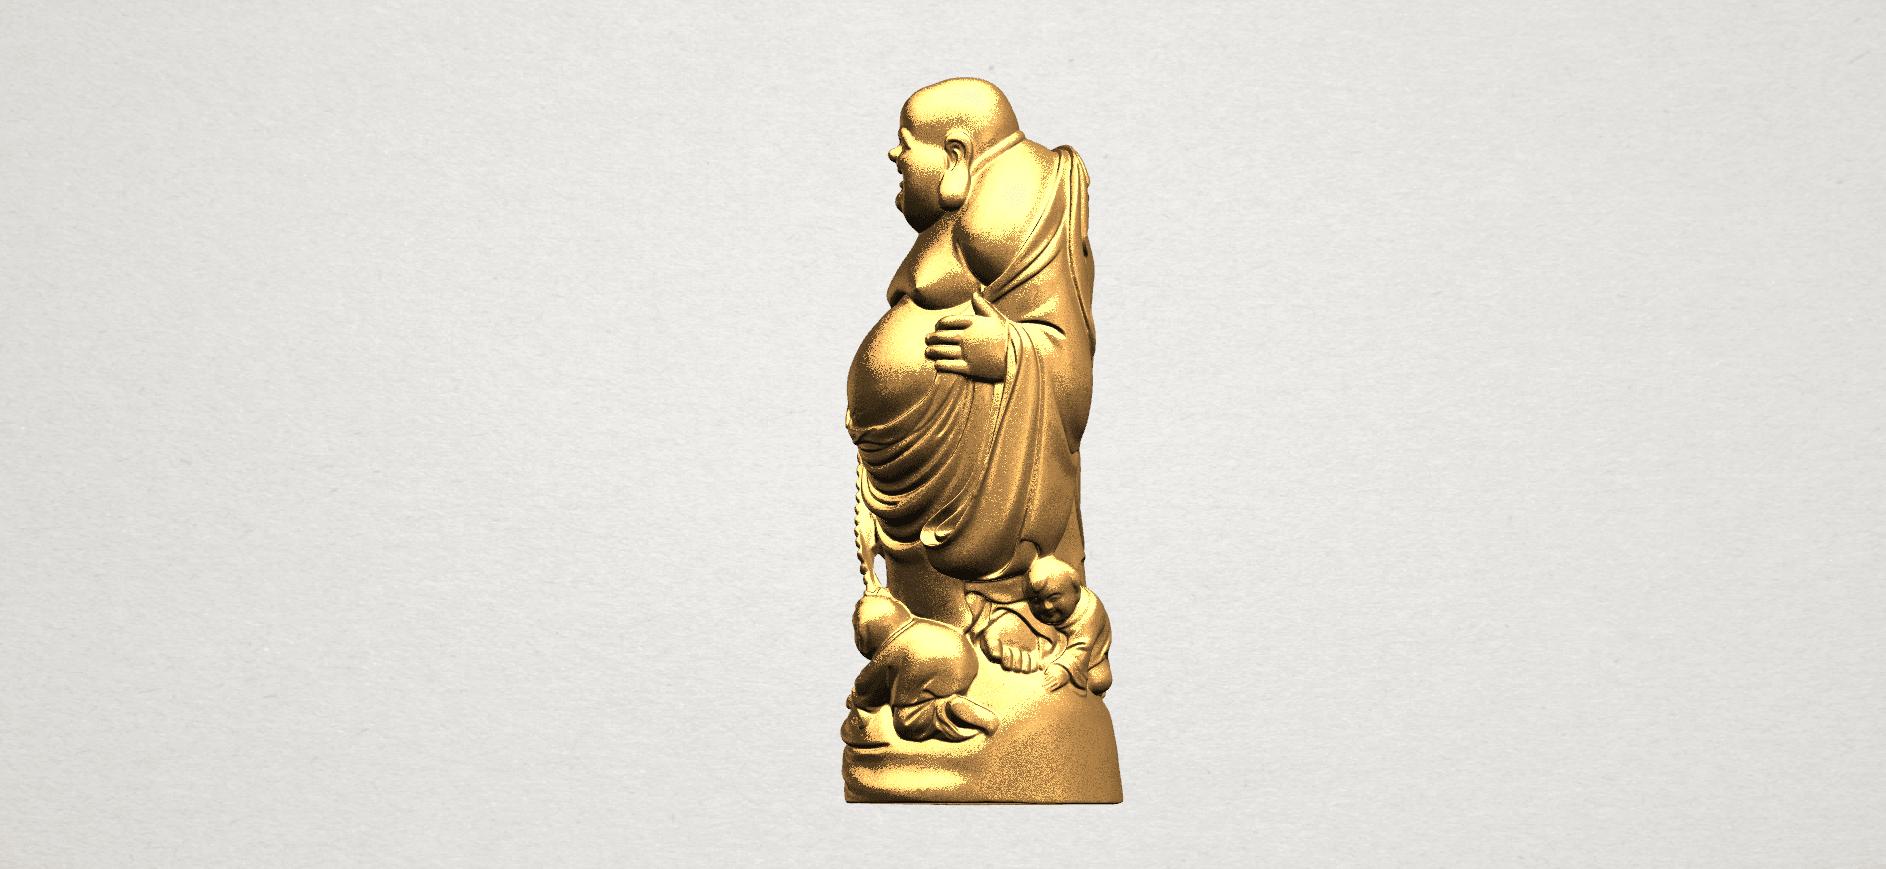 TDA0070 Metteyya Buddha 03 - 88mm - A03.png Download free STL file Metteyya Buddha 03 • 3D printing object, GeorgesNikkei